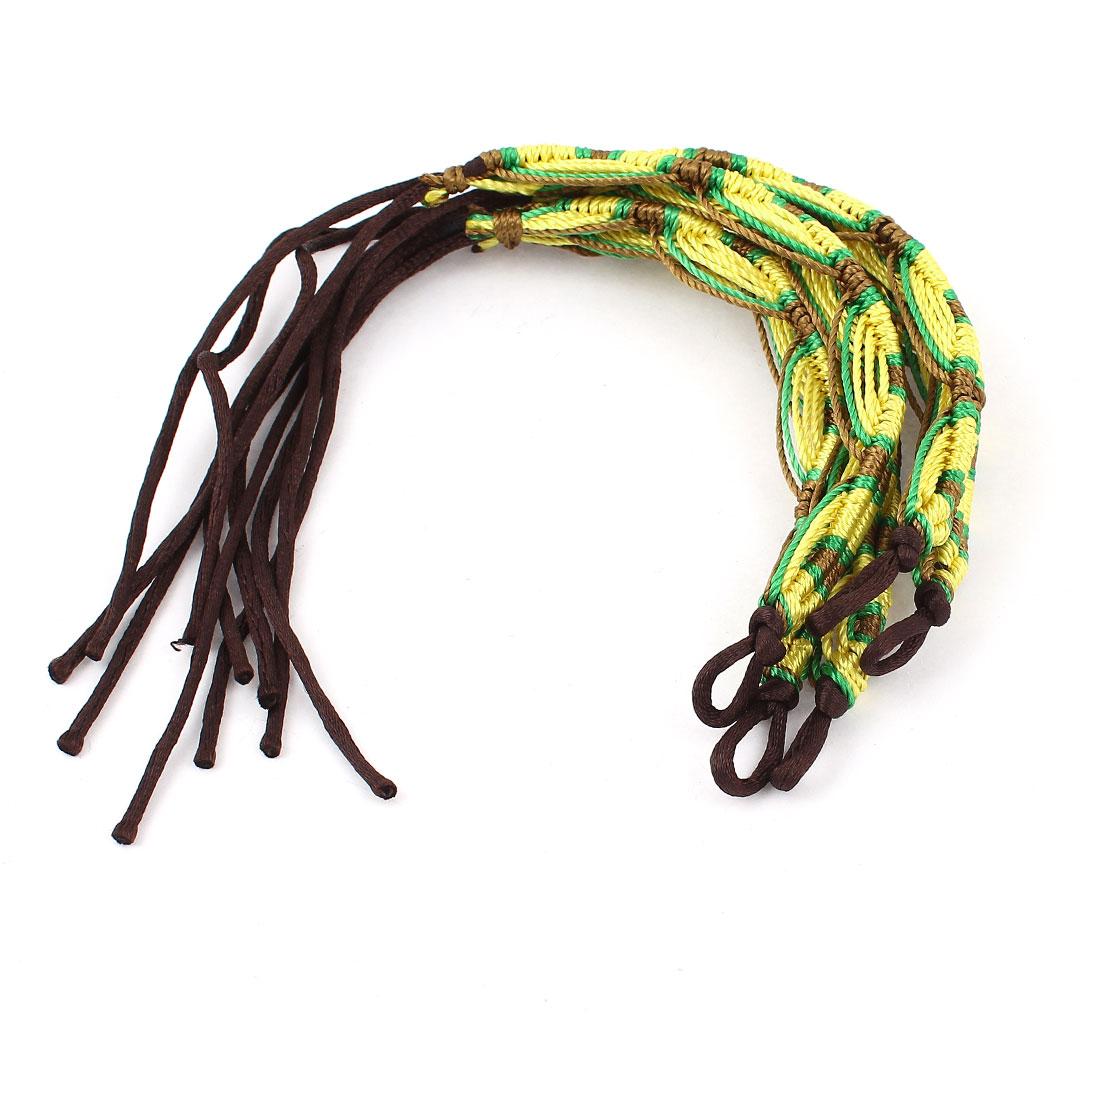 Women 4 Color Nylon Cord Handmade Braided Wrist Accent Bracelet 5 Pieces